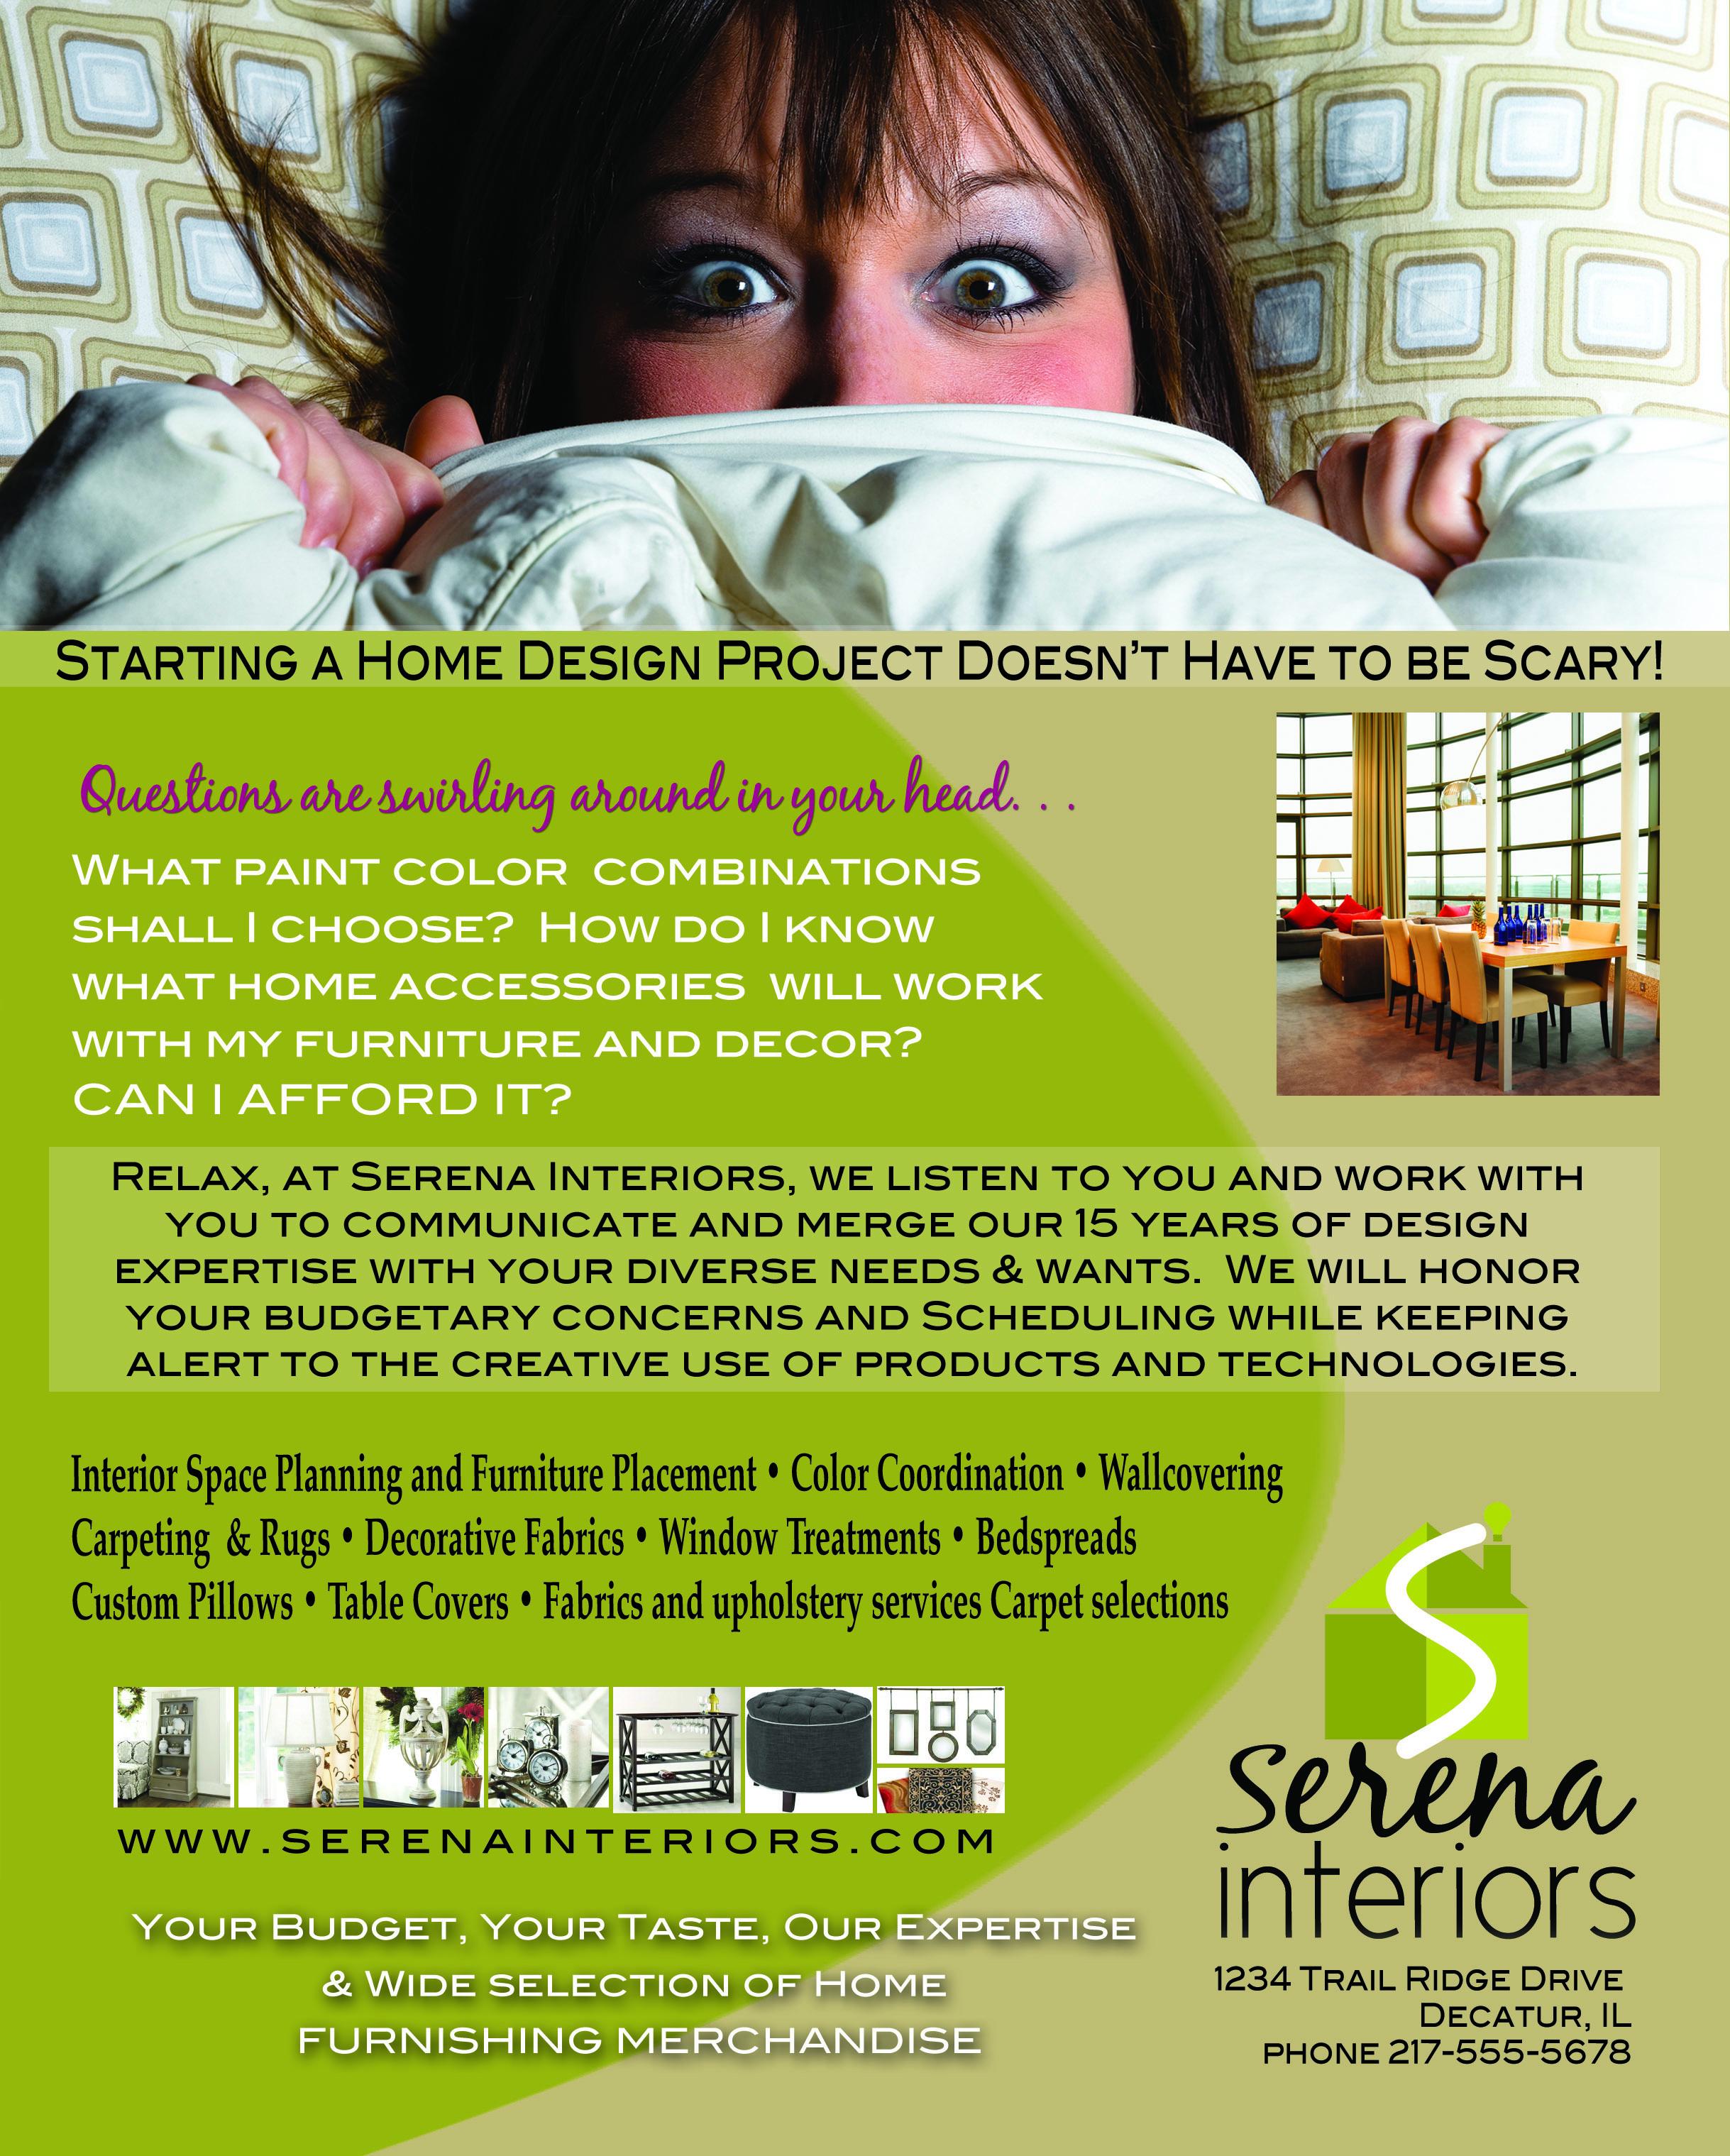 Serena Interiors Advertisement